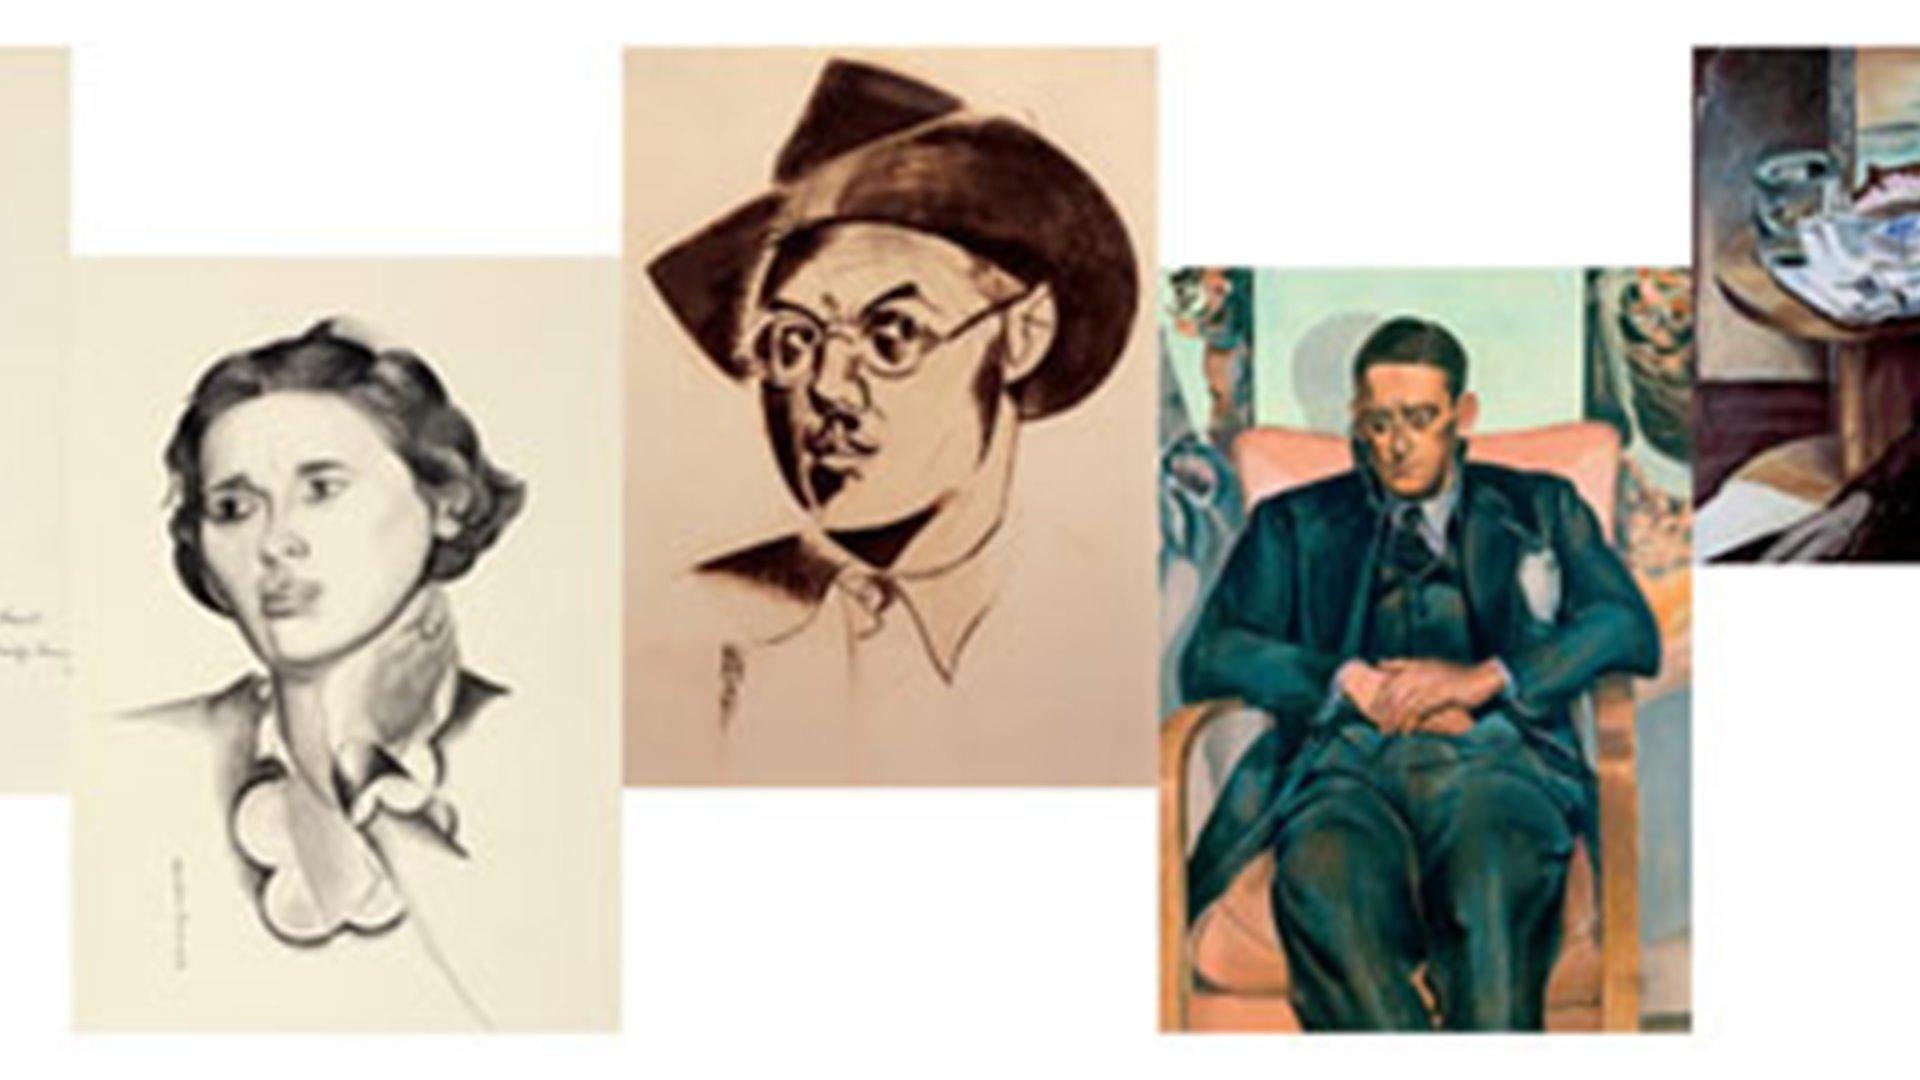 Portrayal of James Joyce